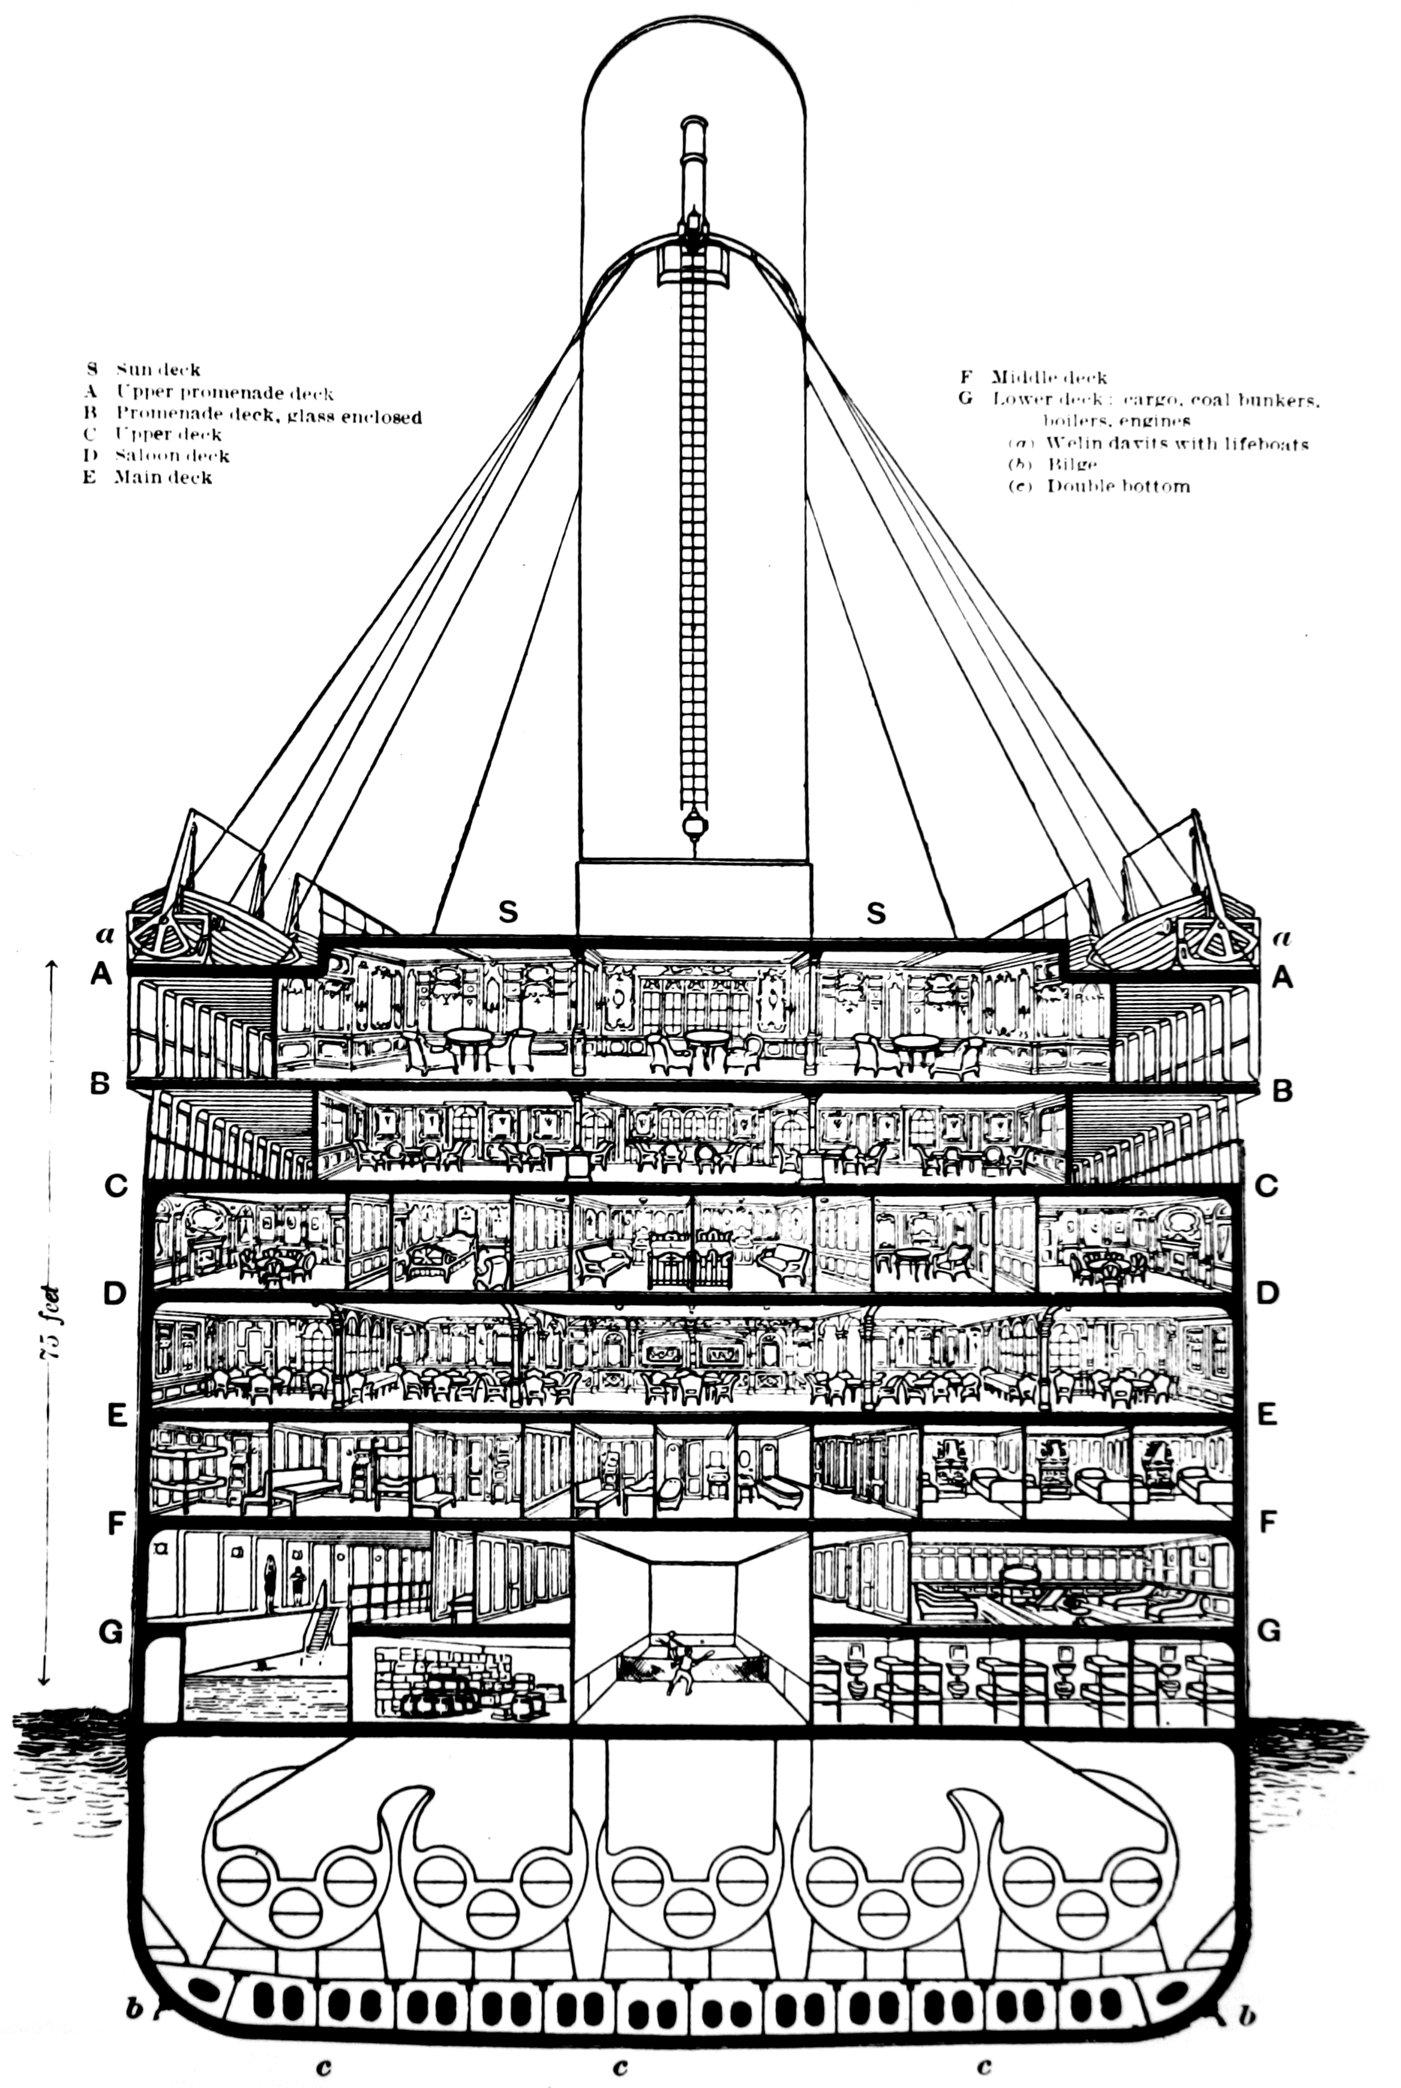 Titanic_cutaway_diagram